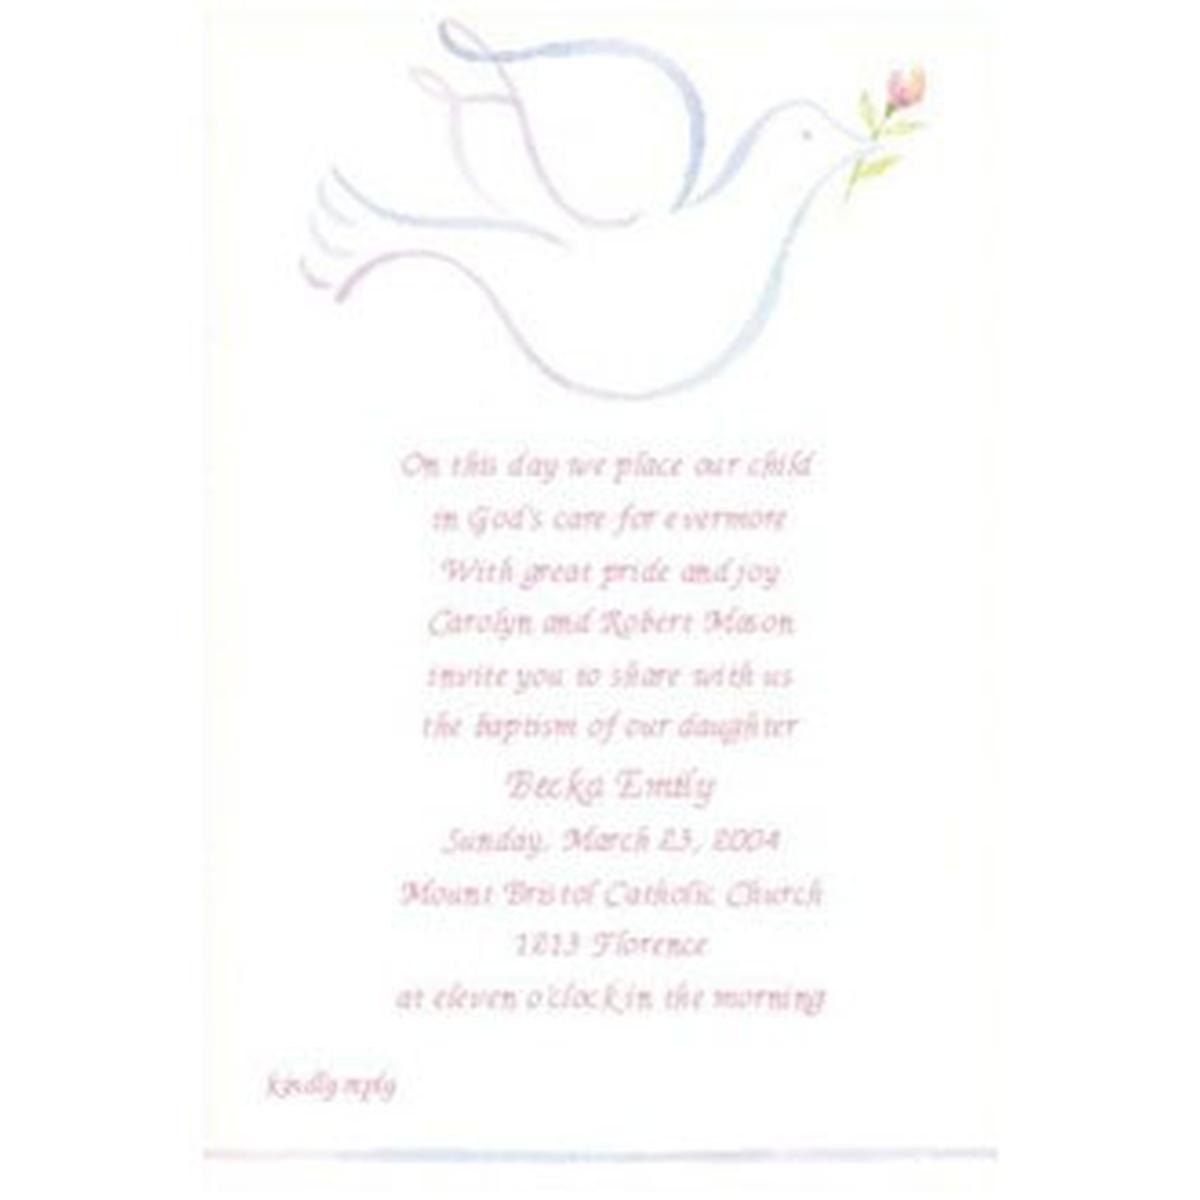 Cherish Paperie: Wedding Programs, Envelopments, Wedding